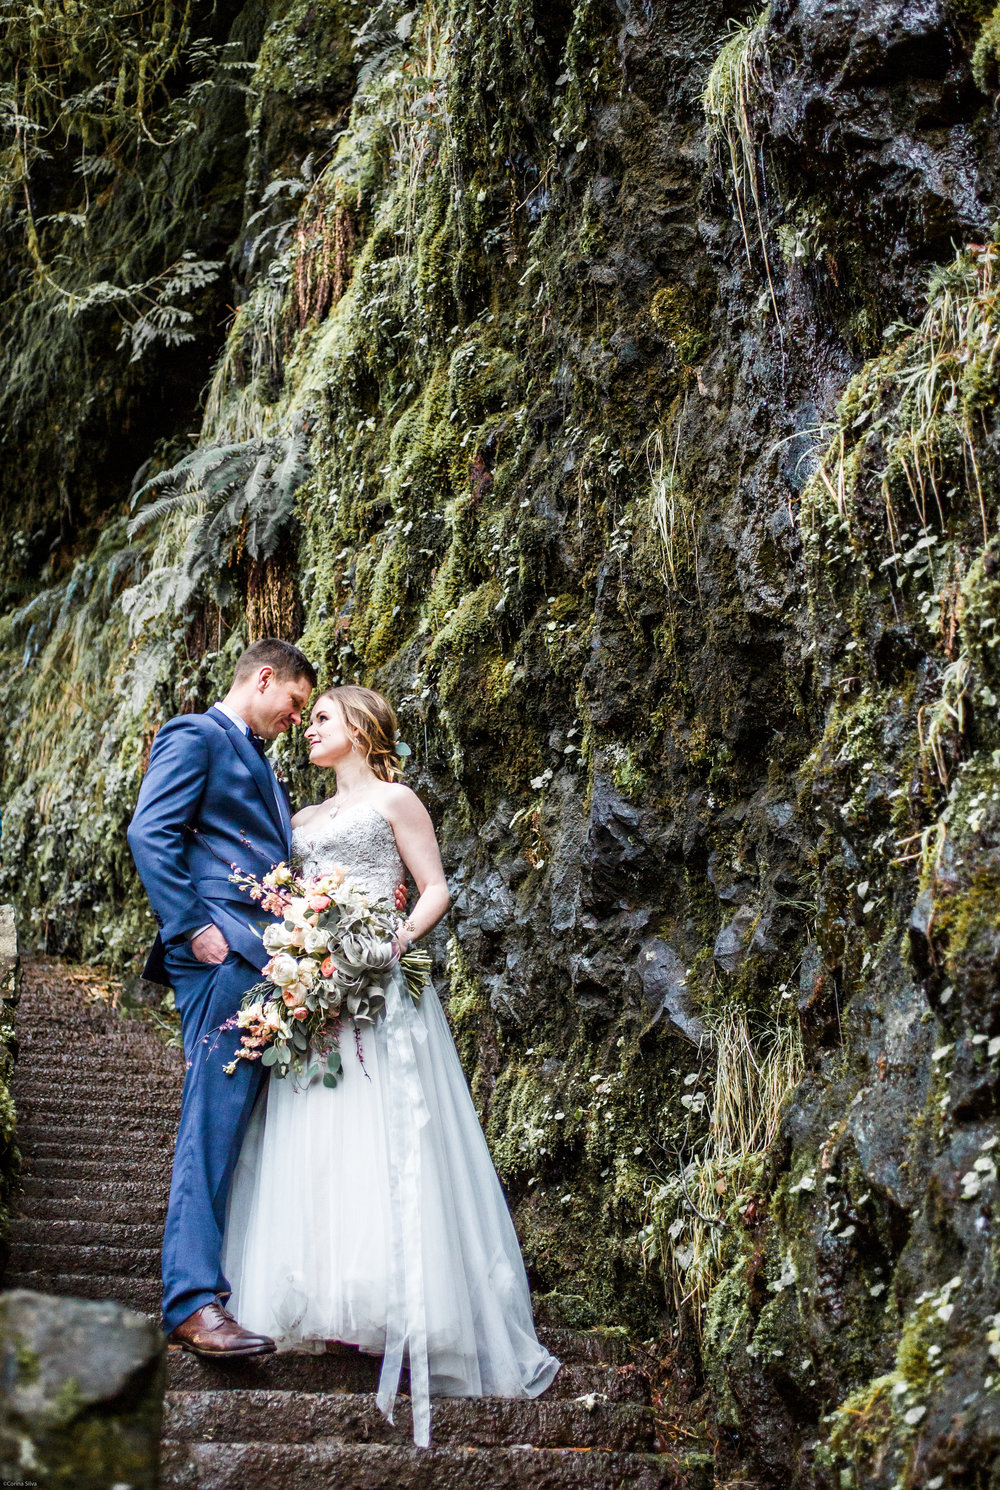 Silver Falls-elopement-bride-and-groom-photo Corina Silva Studios-174.jpg